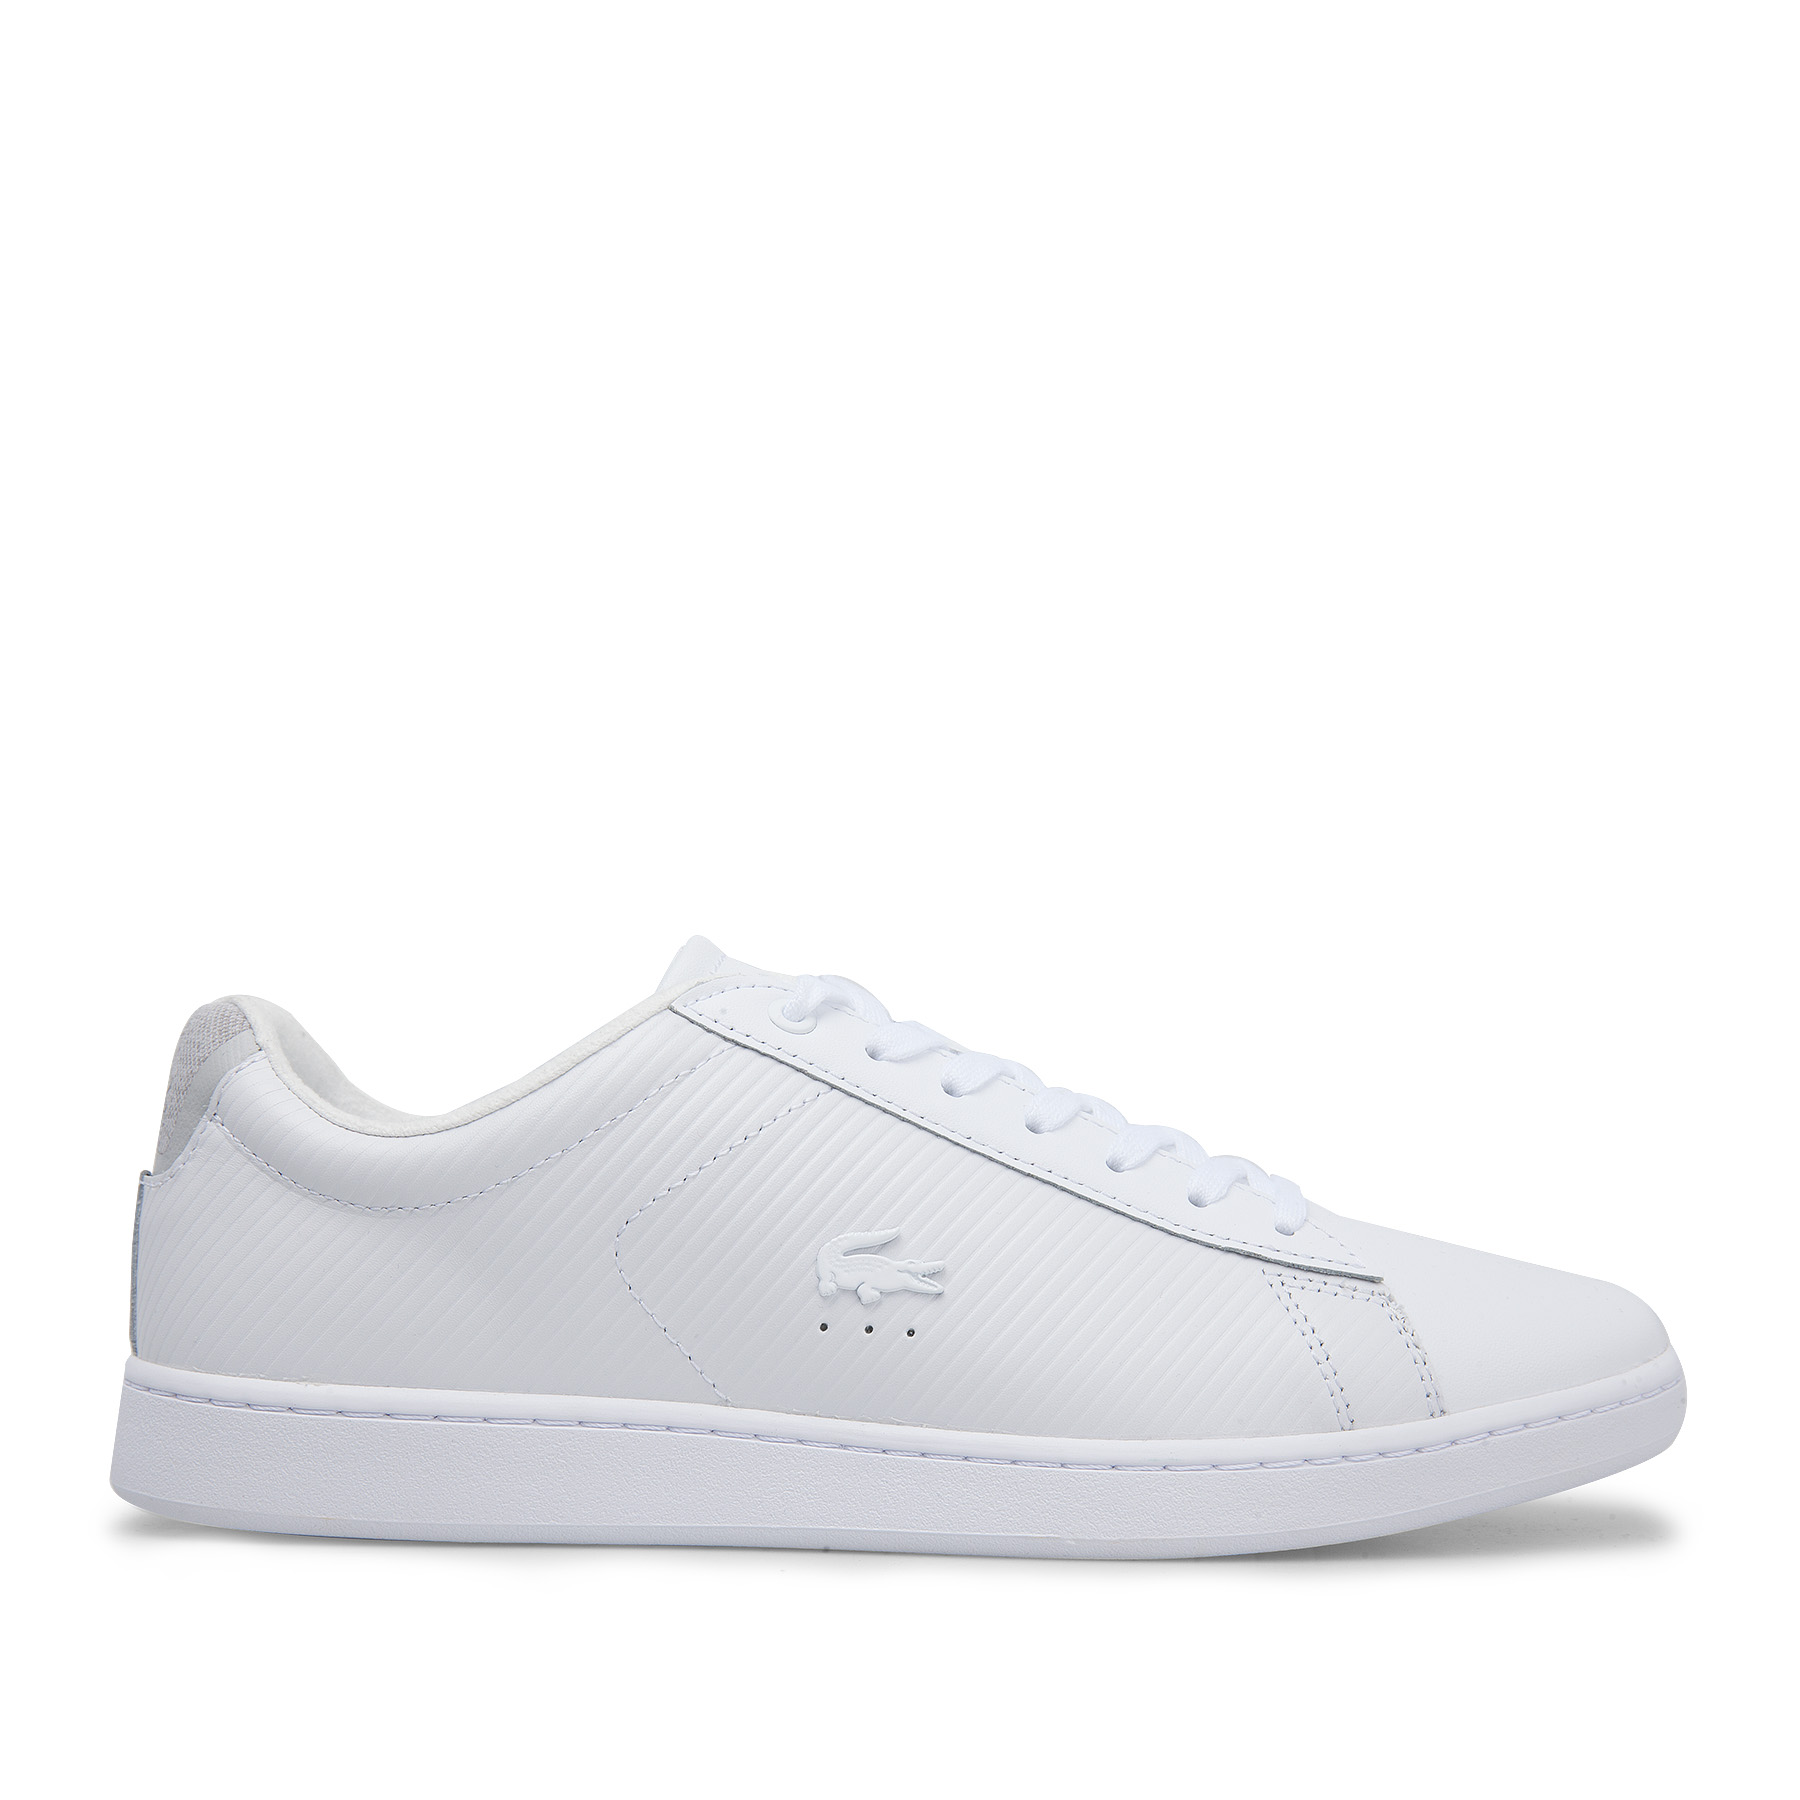 Lacoste Carnaby Shoes MEN SHOES 7 Men's